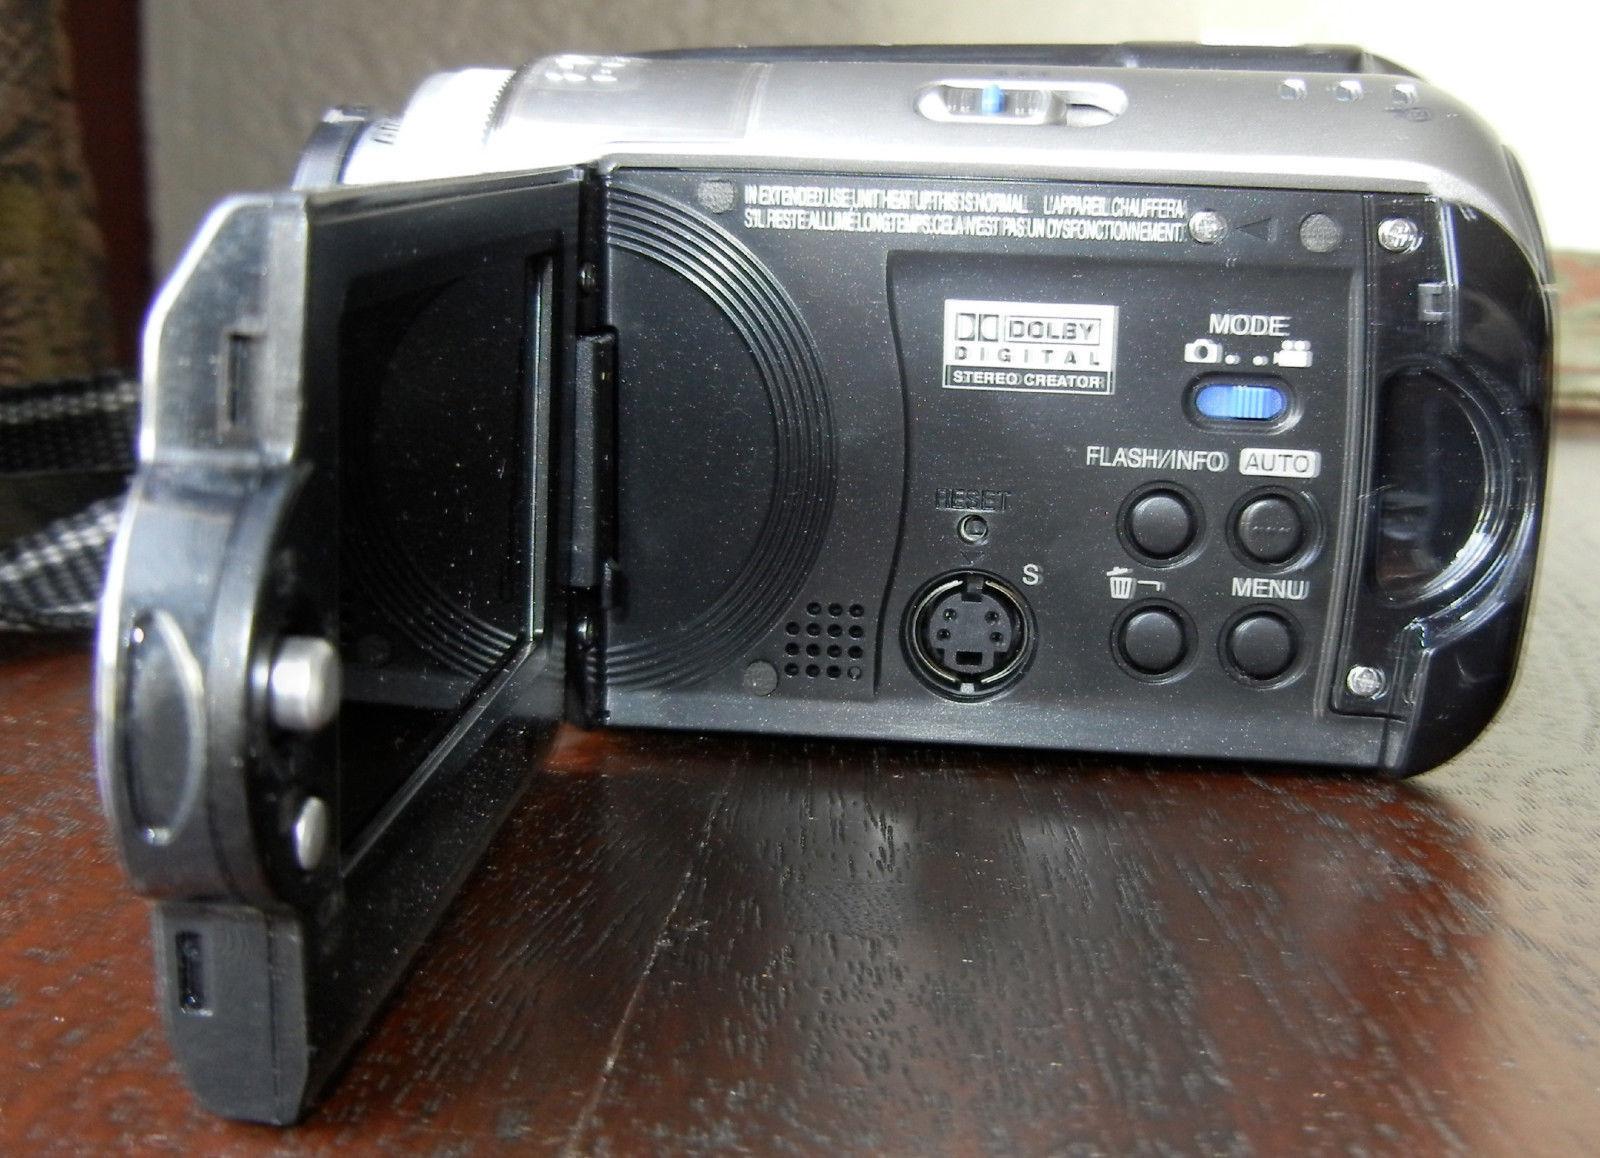 jvc everio gz mg77u 30gb digital hard drive and similar items rh bonanza com JVC Model GZ -MG630AU JVC Everio Gz MS120